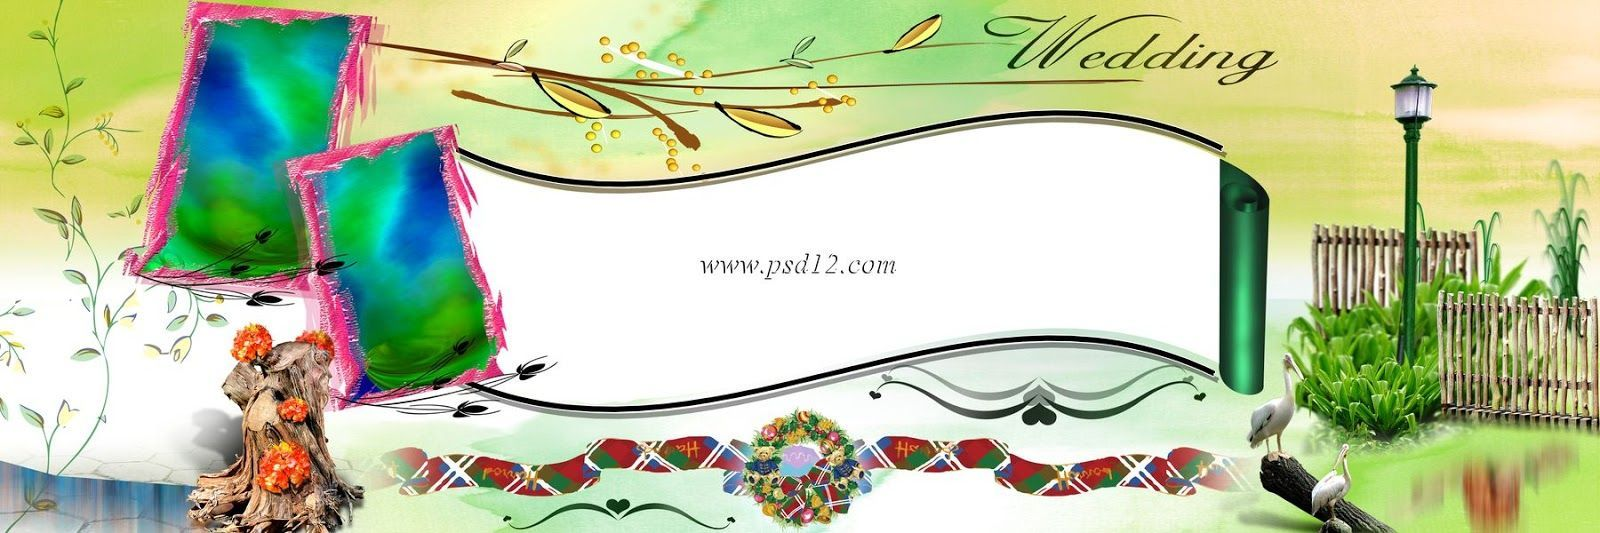 Photoshop Backgrounds Wedding Album Design 12x36 Psd Files